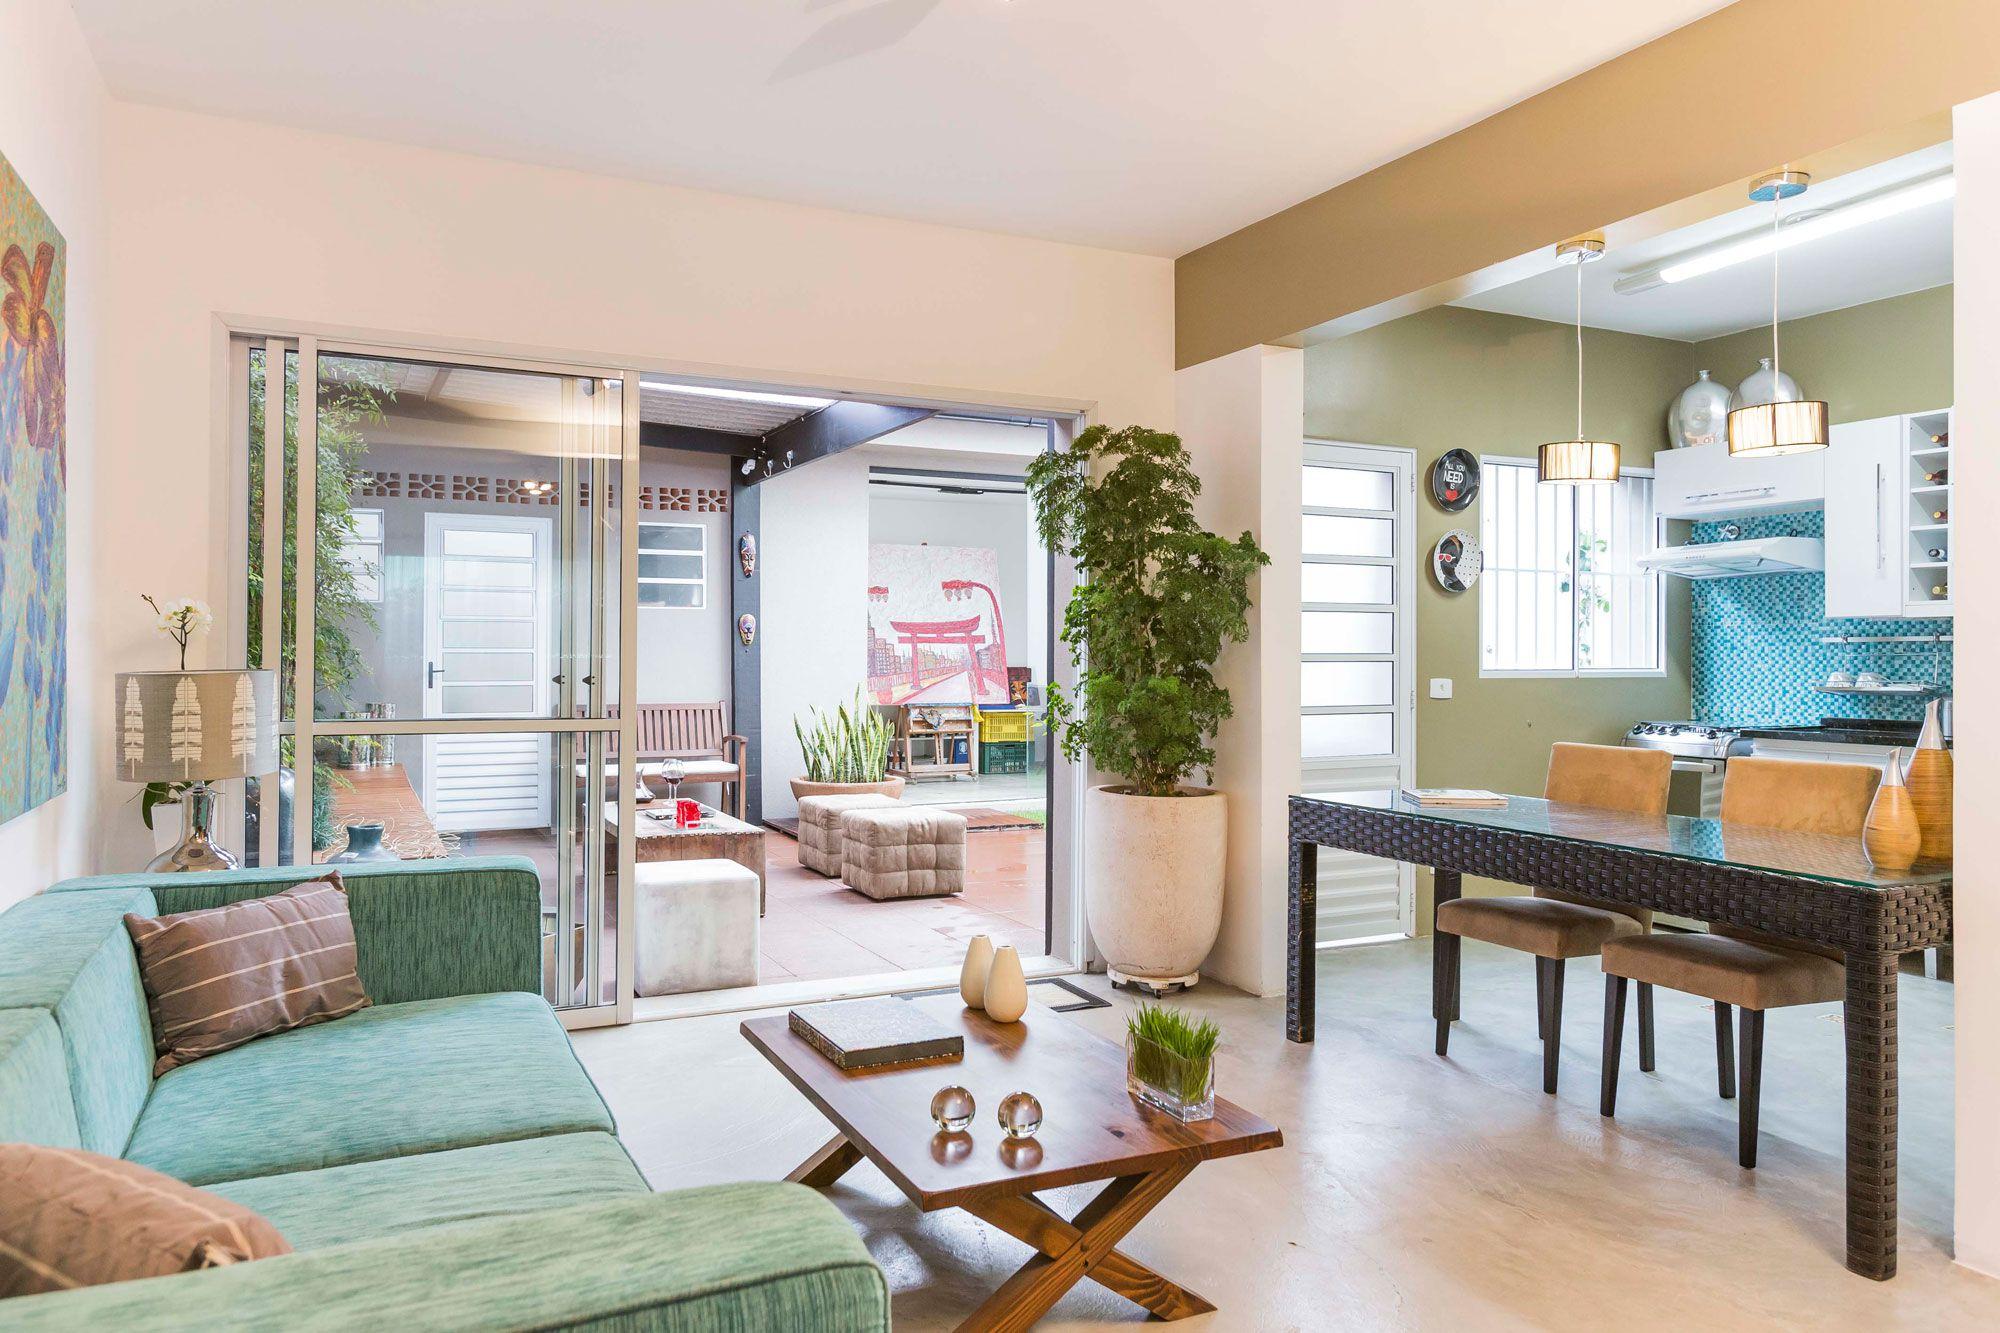 Granja-Julieta-Residence-18